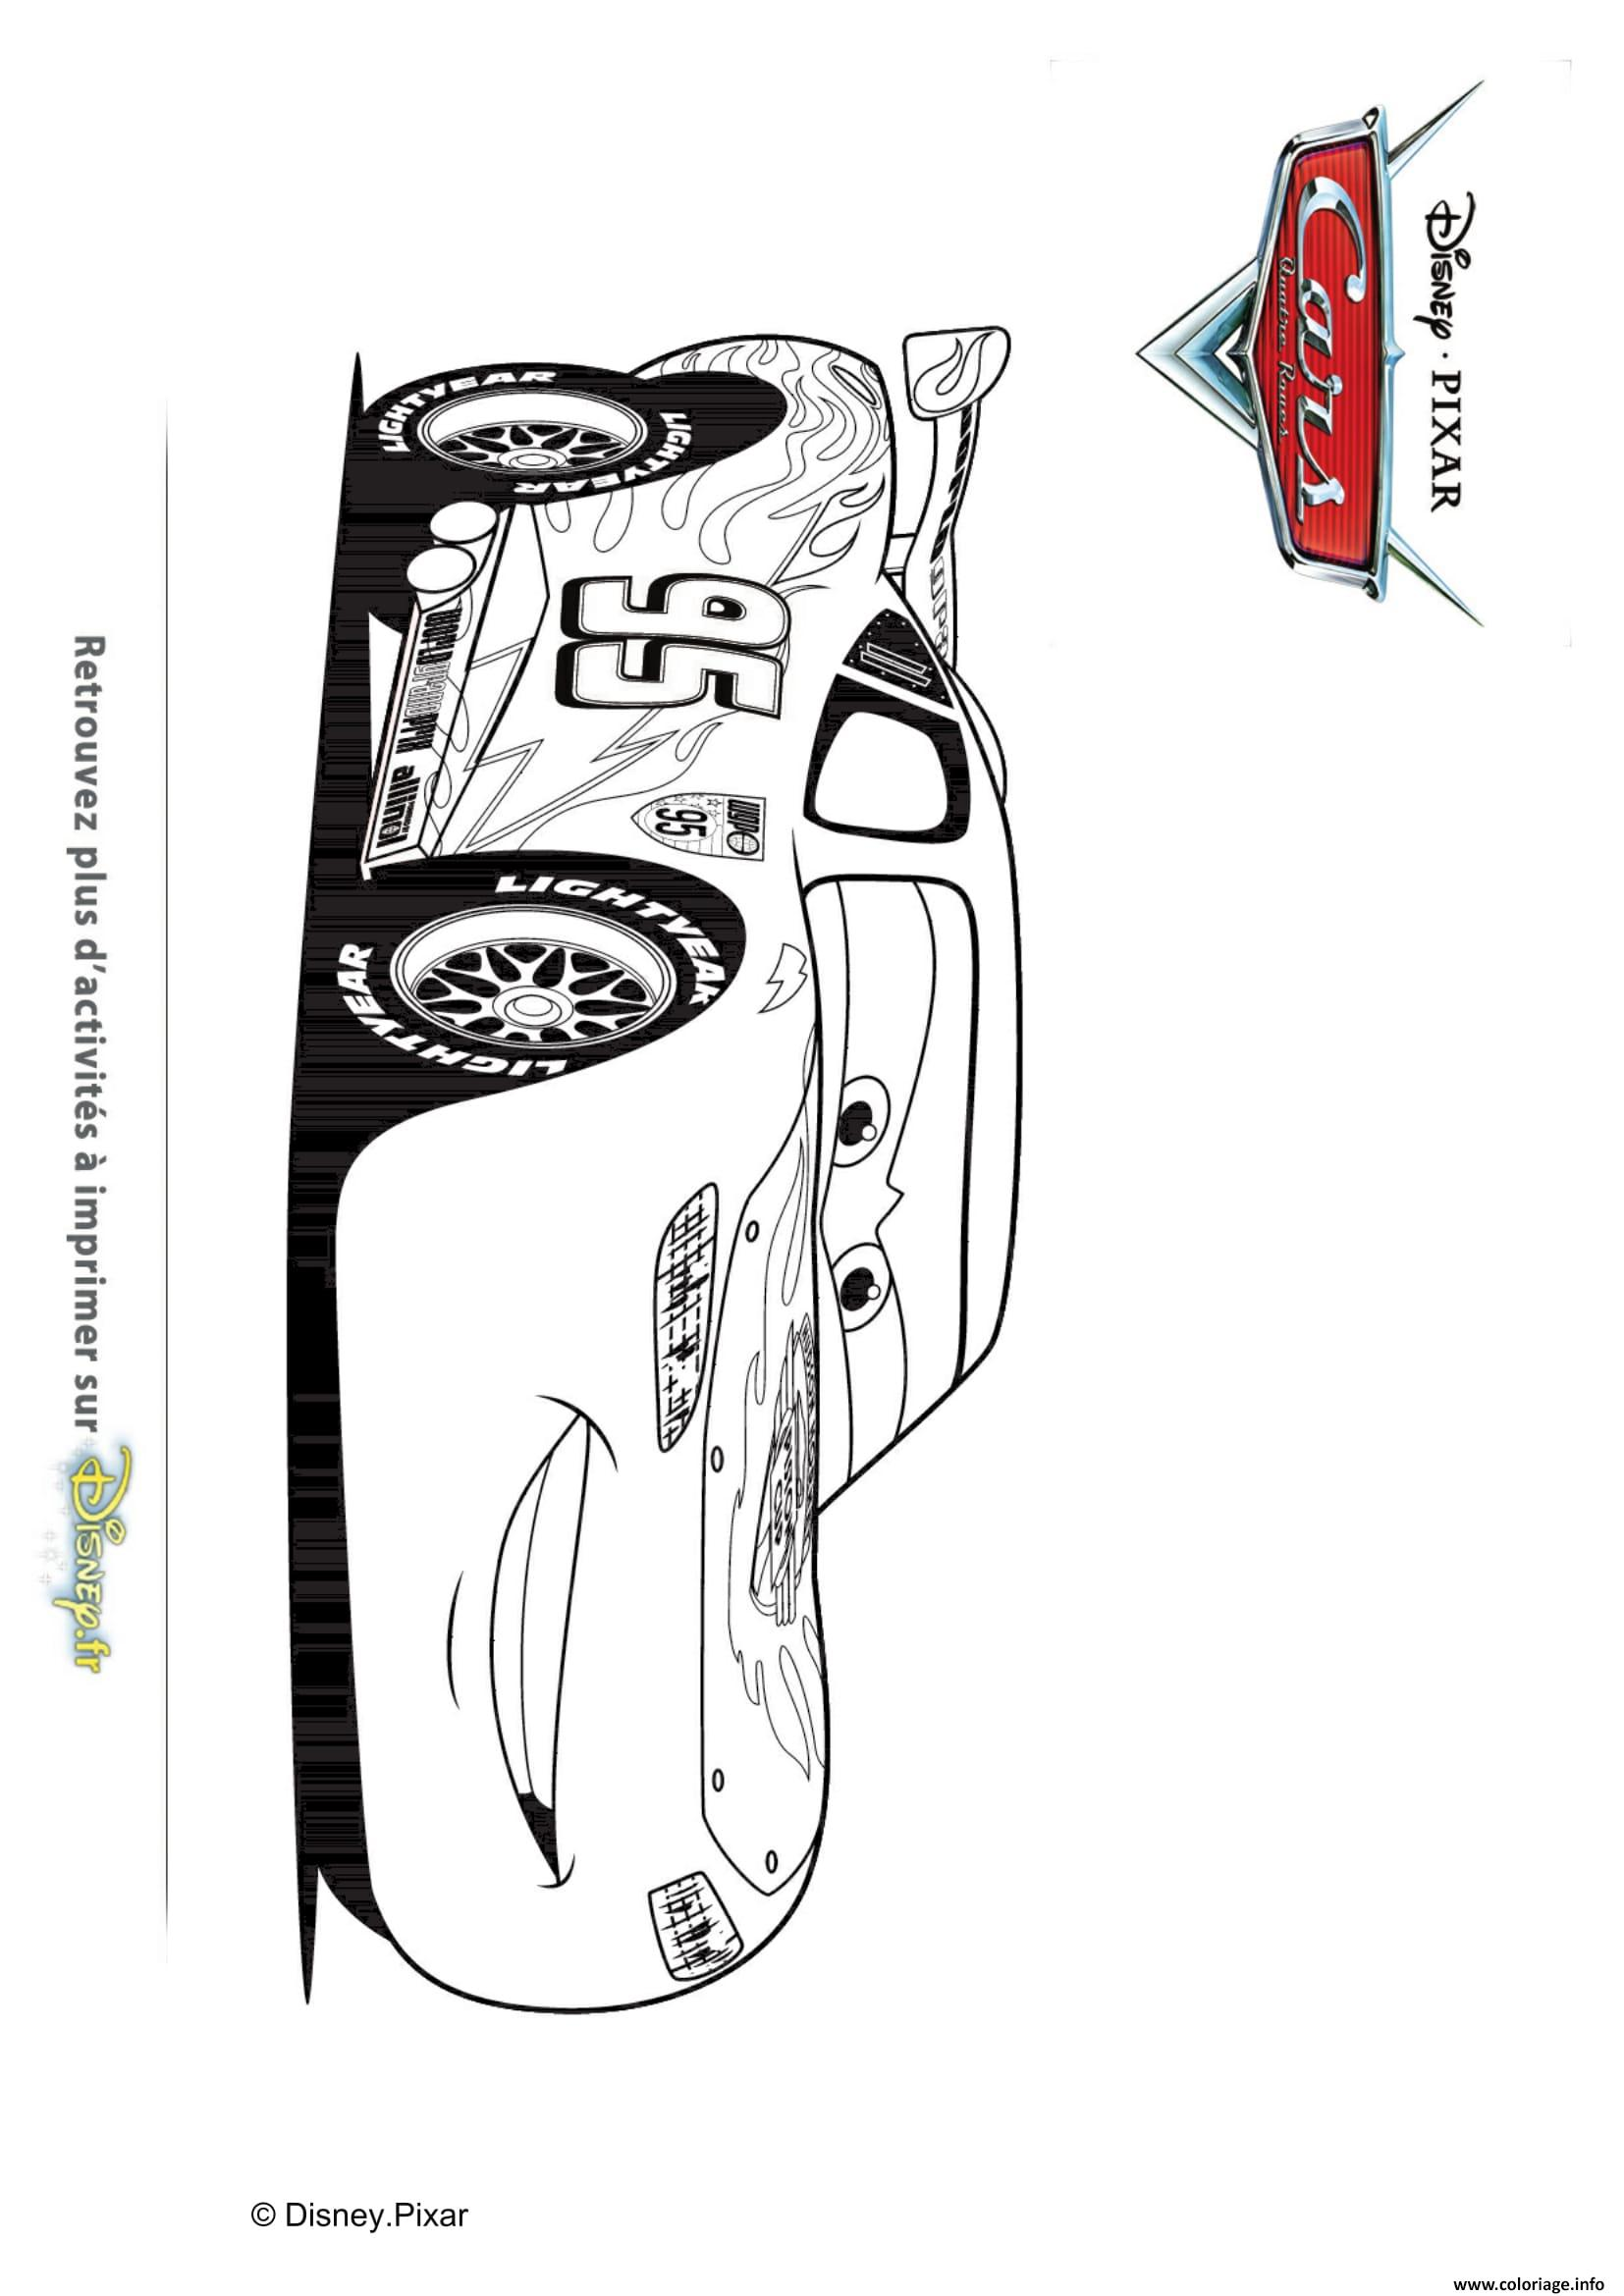 Beau Dessin A Imprimer De Cars 3